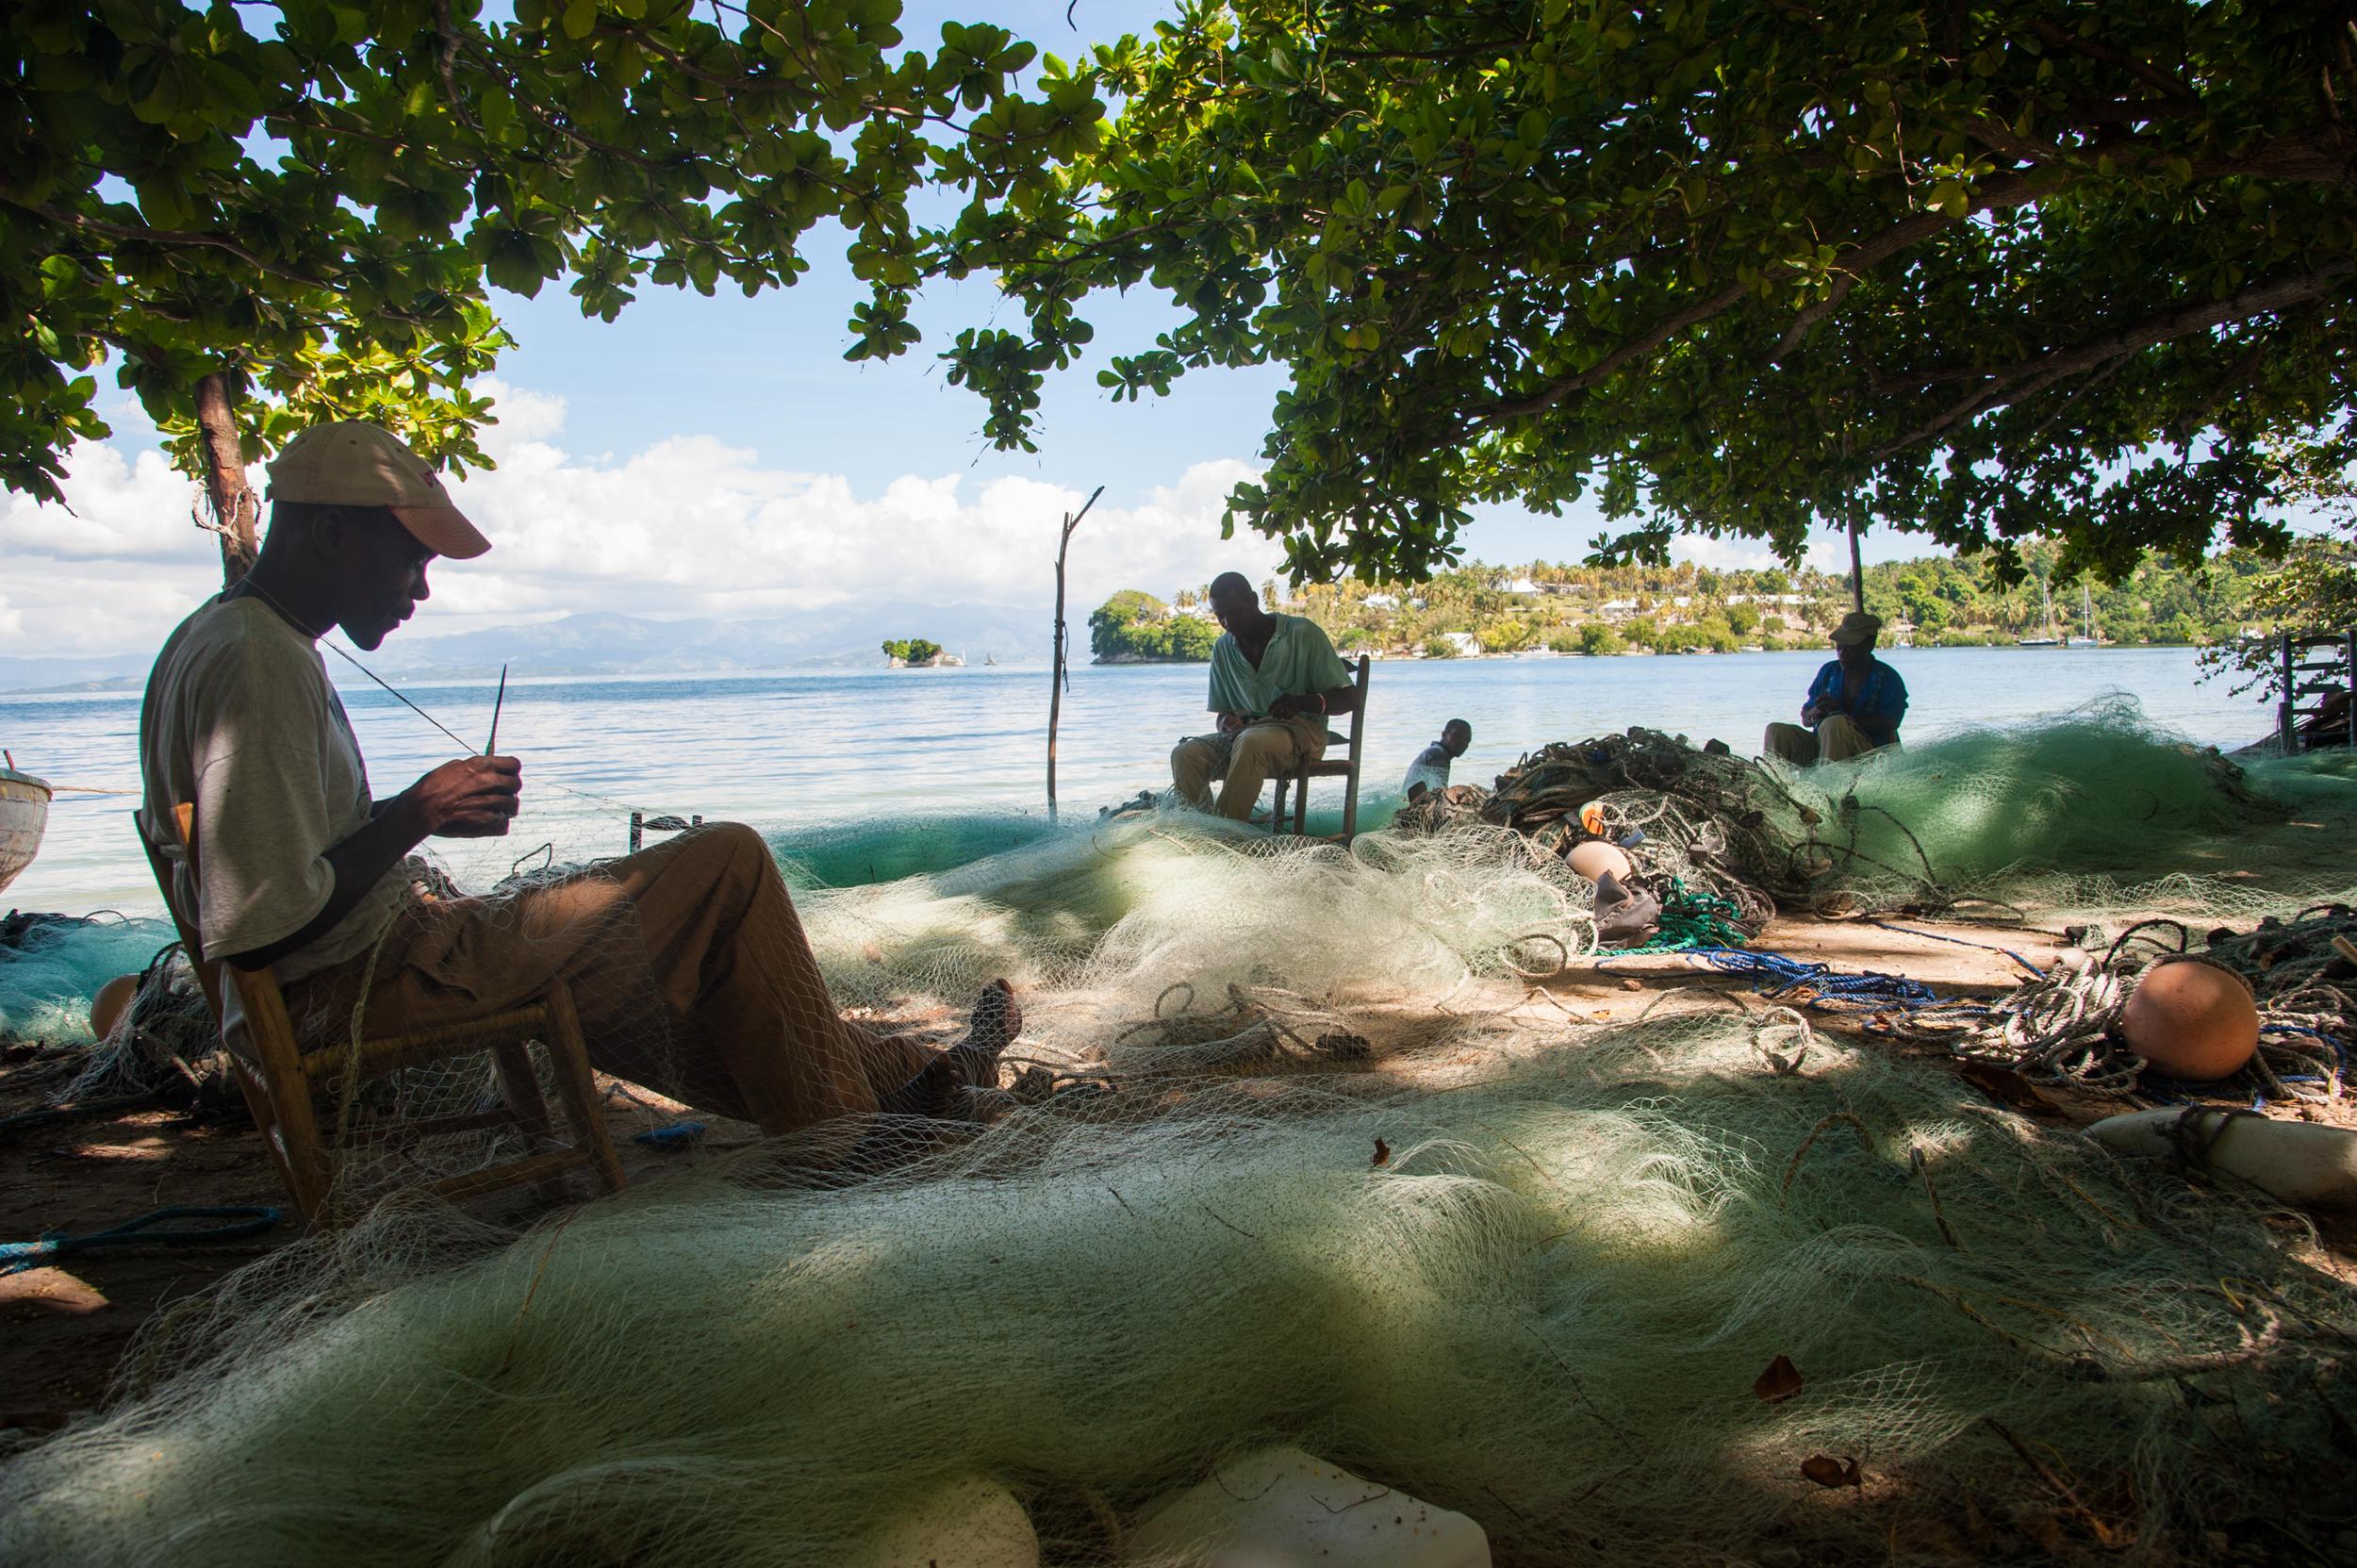 SimonRussellPhotography_Haiti-19.jpg